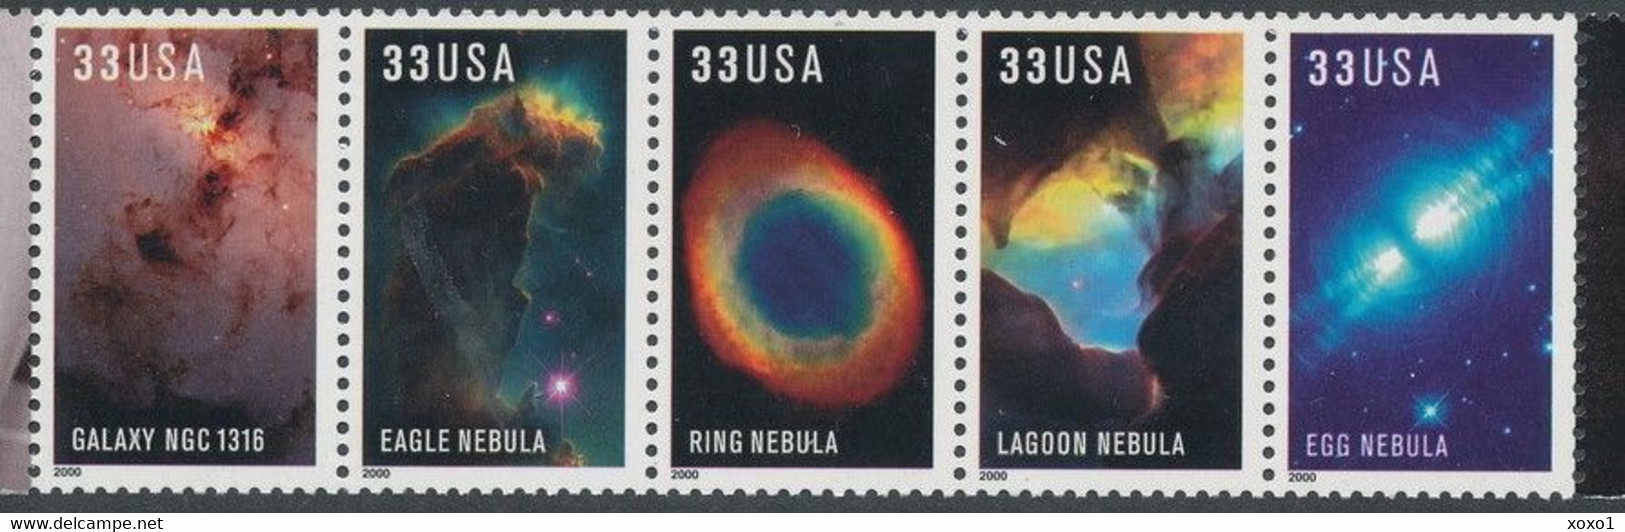 USA 2000 Space, Hubble, Astronomy 5v MNH** - Astronomy